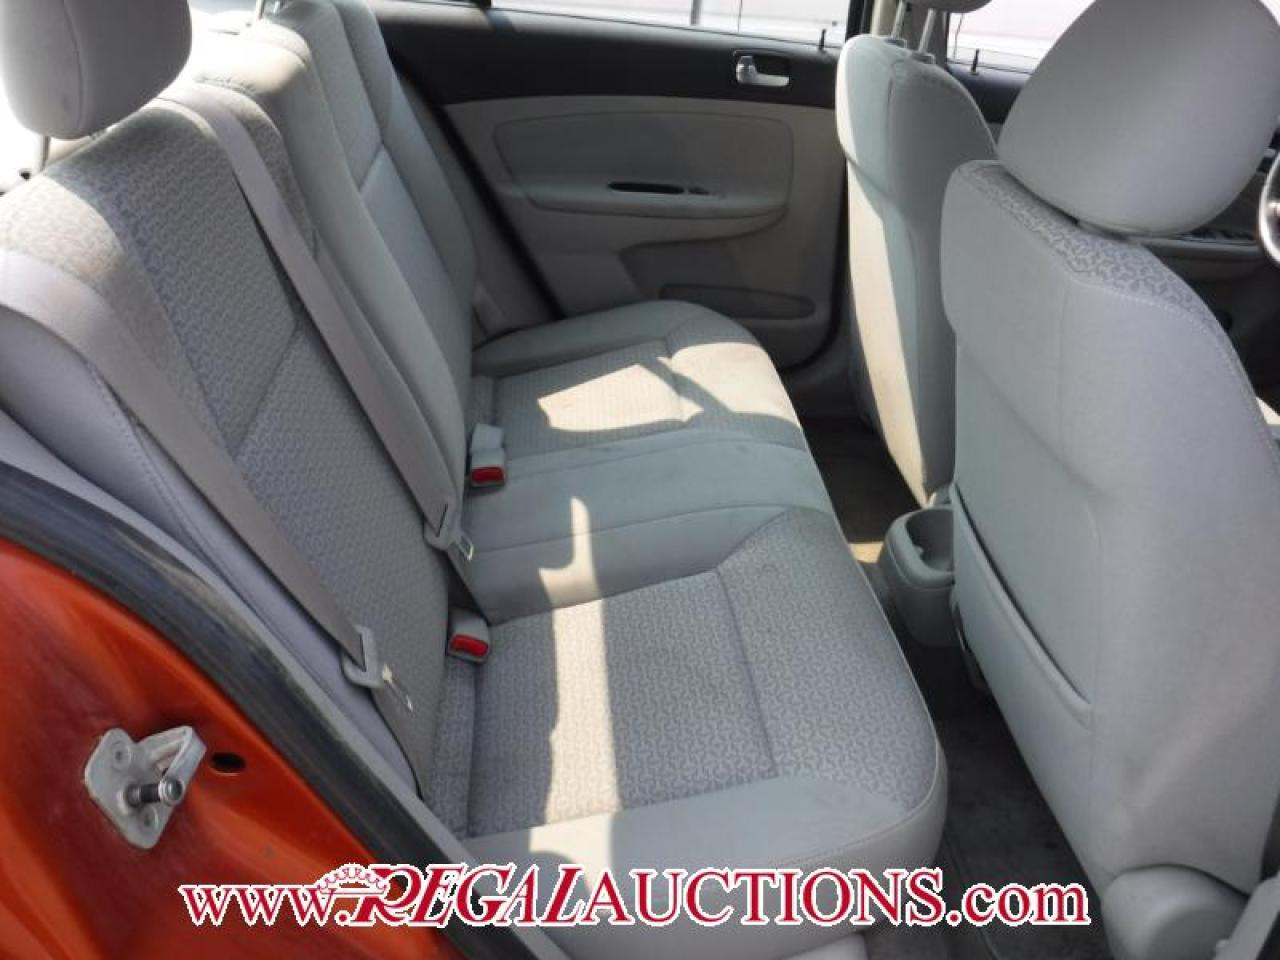 2006 Pontiac PURSUIT SE 4D SEDAN